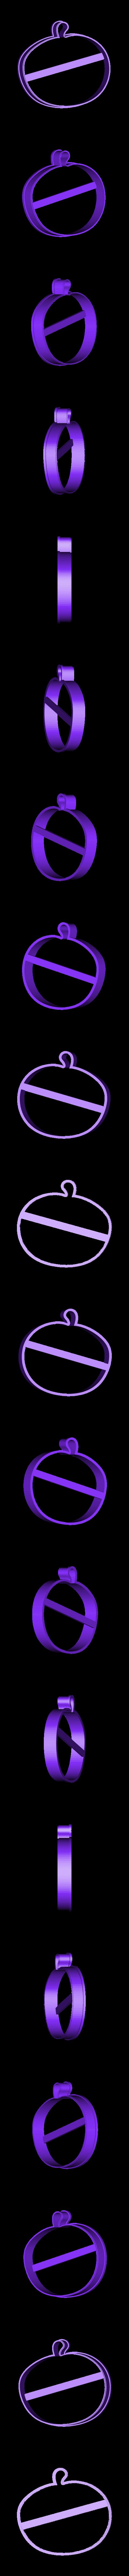 00171 tikva.stl Download OBJ file Pumpkin cookie cutter for professional  • 3D print design, gleblubin